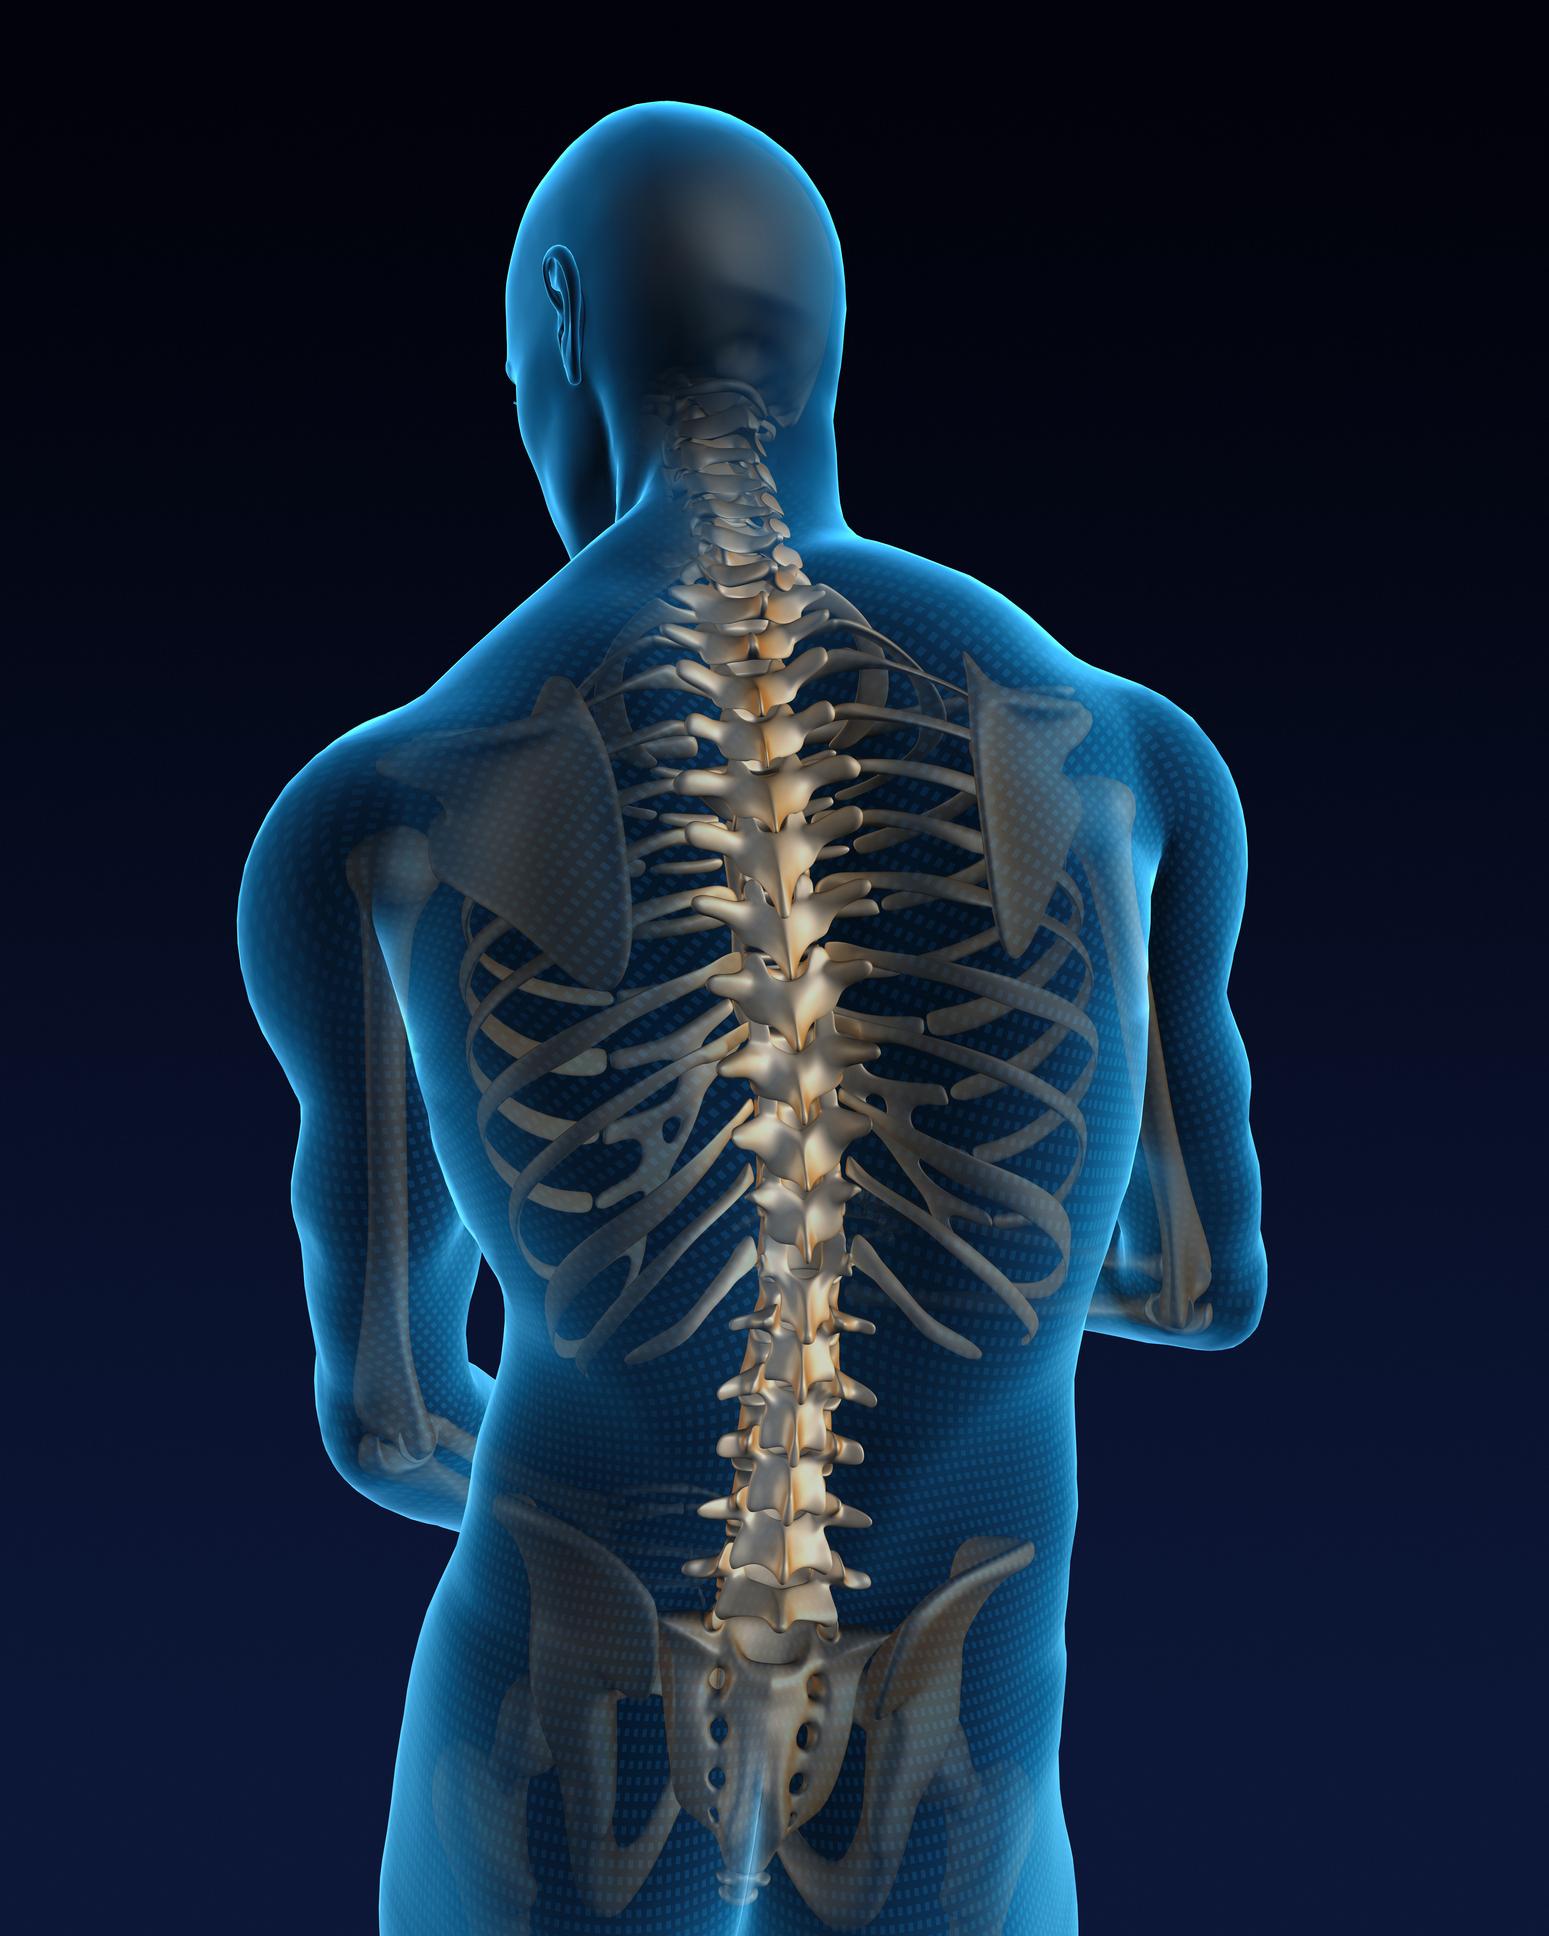 Human back illustration shown to Arlington TX patient